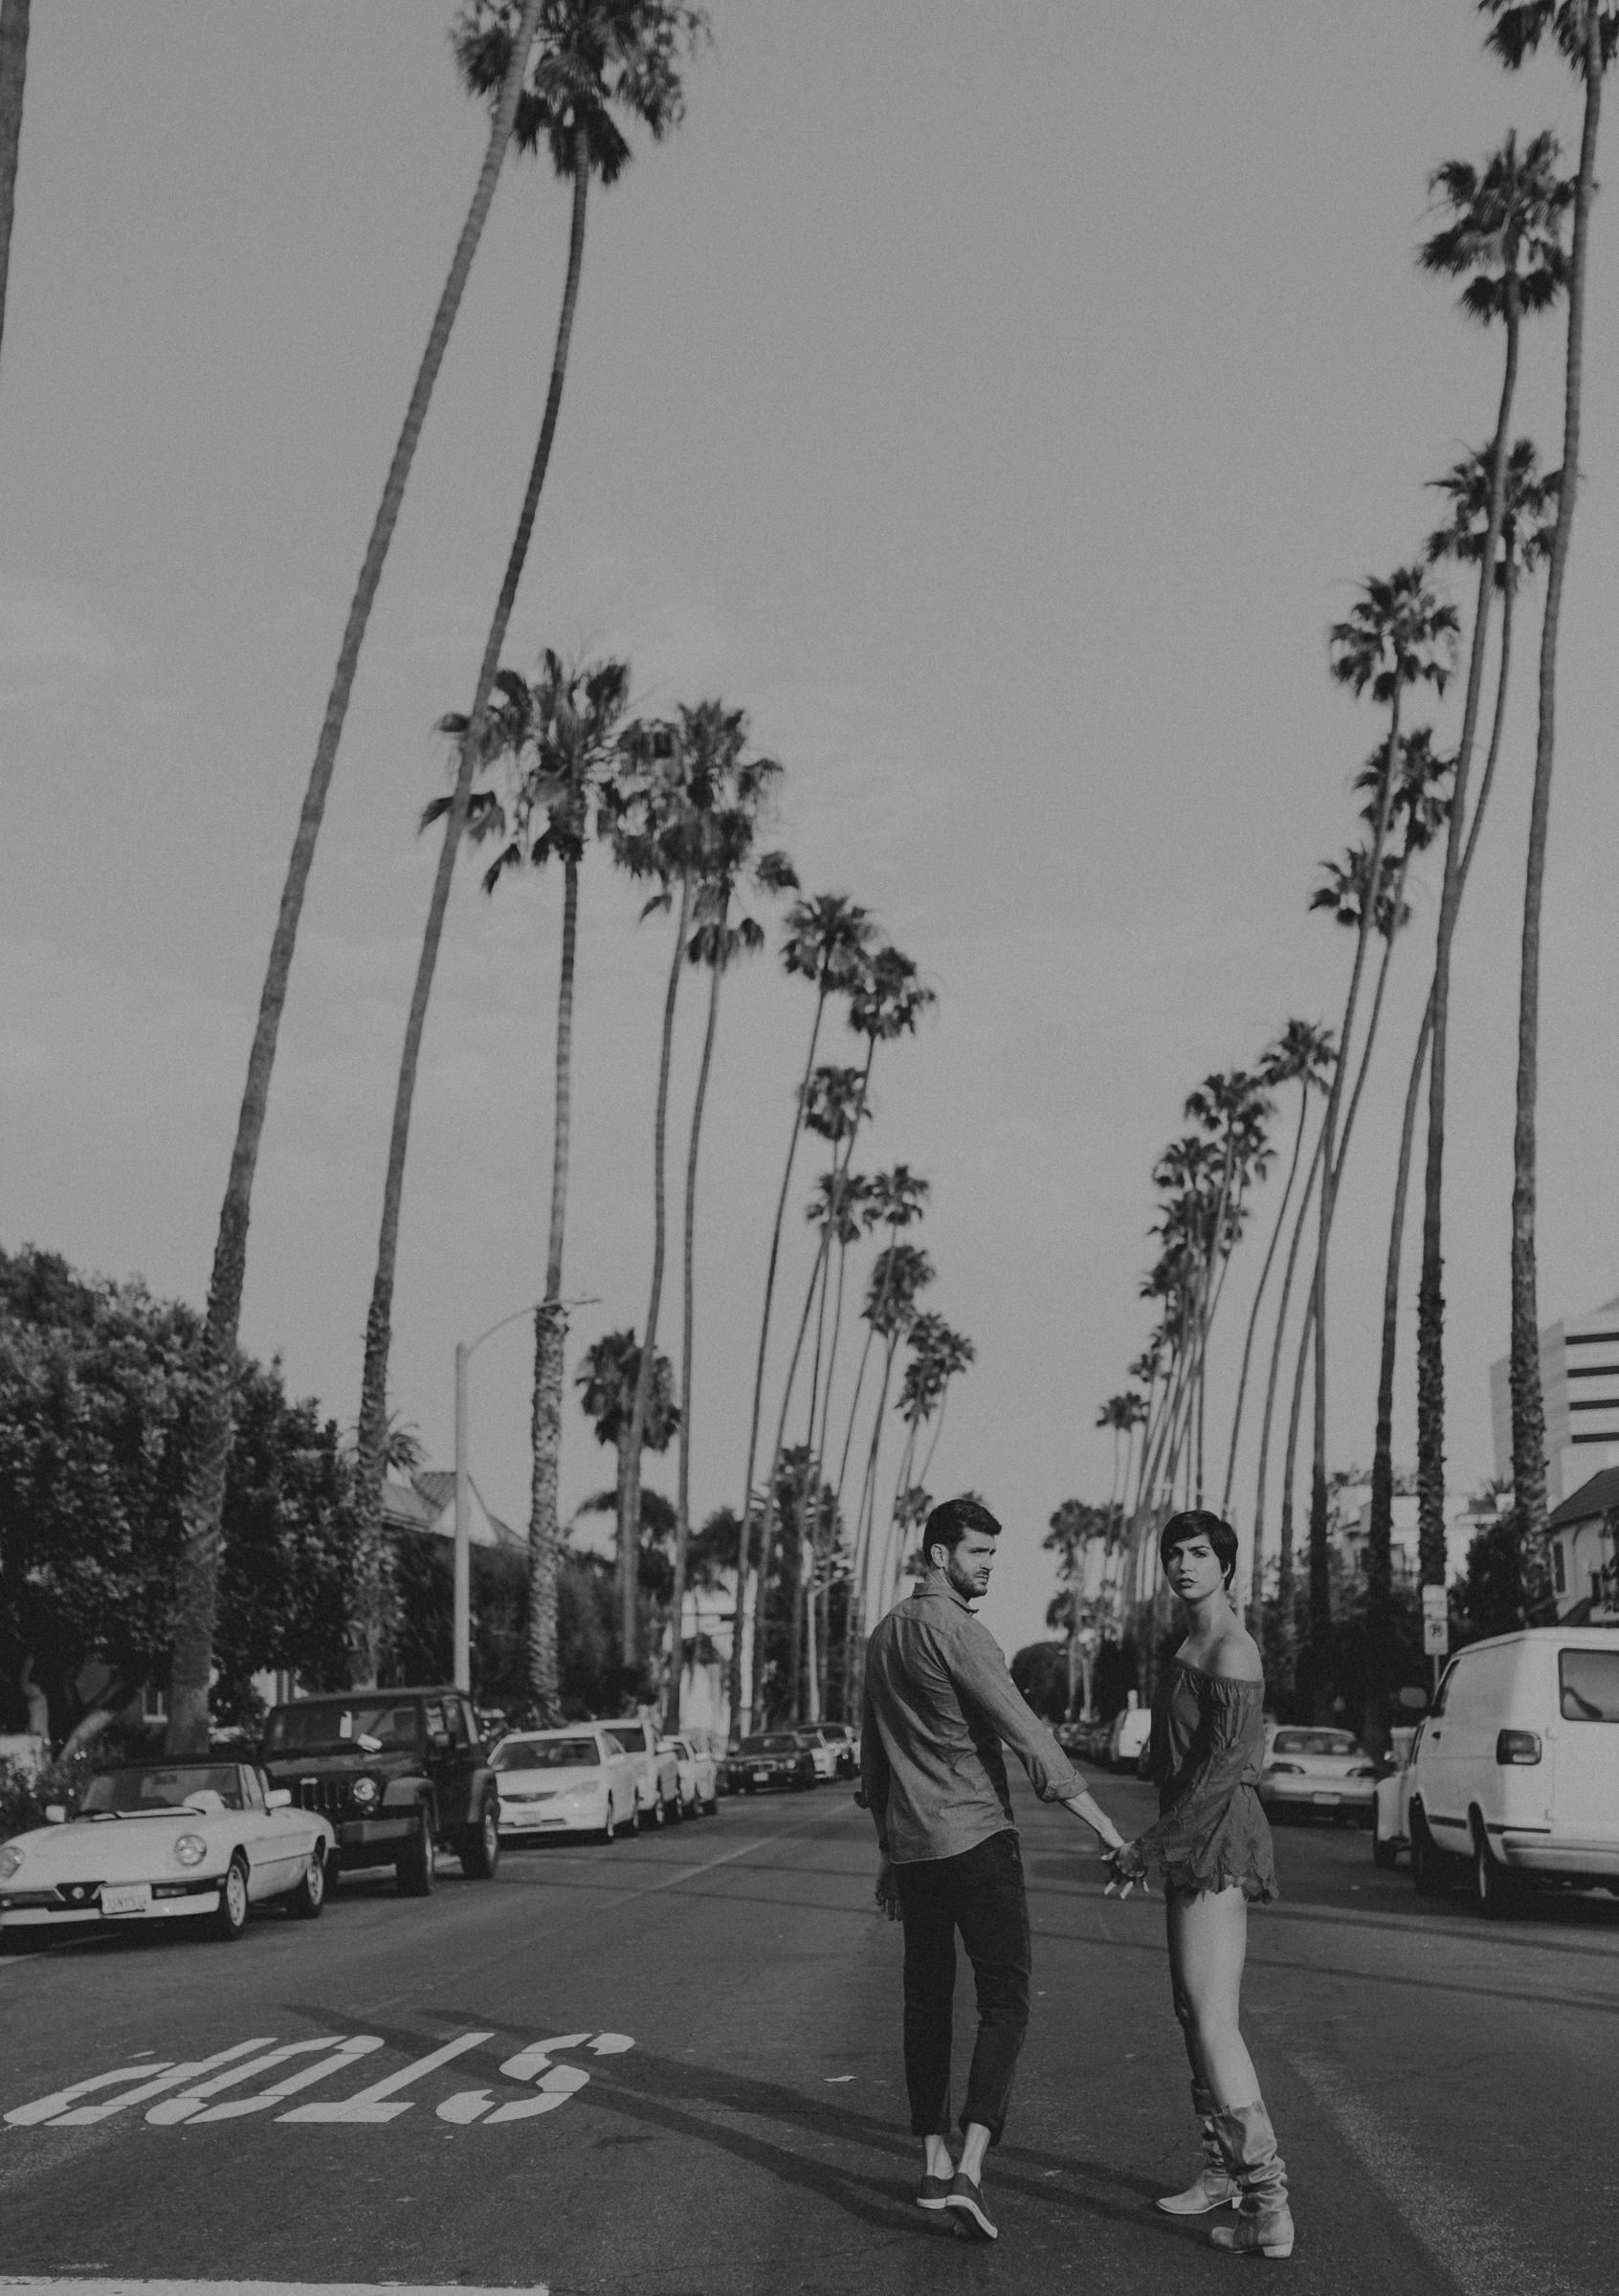 Isaiah + Taylor Photography - Santa Monica Engagement Session, Los Angeles Wedding Photographer-002.jpg